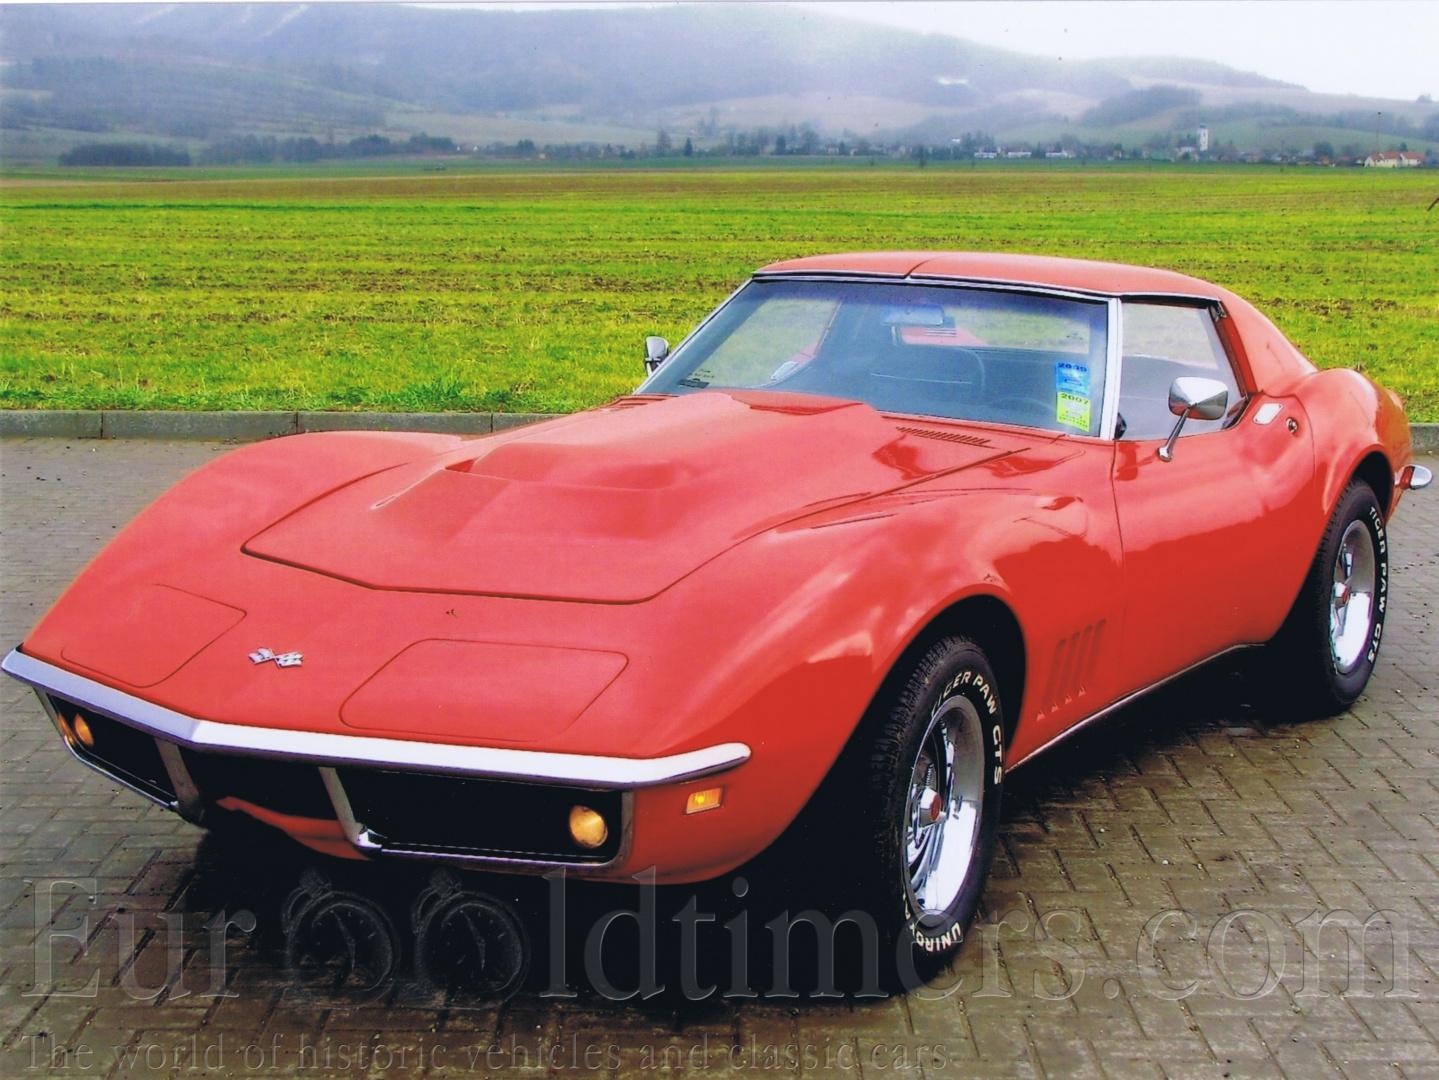 1967 74 chevrolet corvette c3 gallery veter ni i. Black Bedroom Furniture Sets. Home Design Ideas